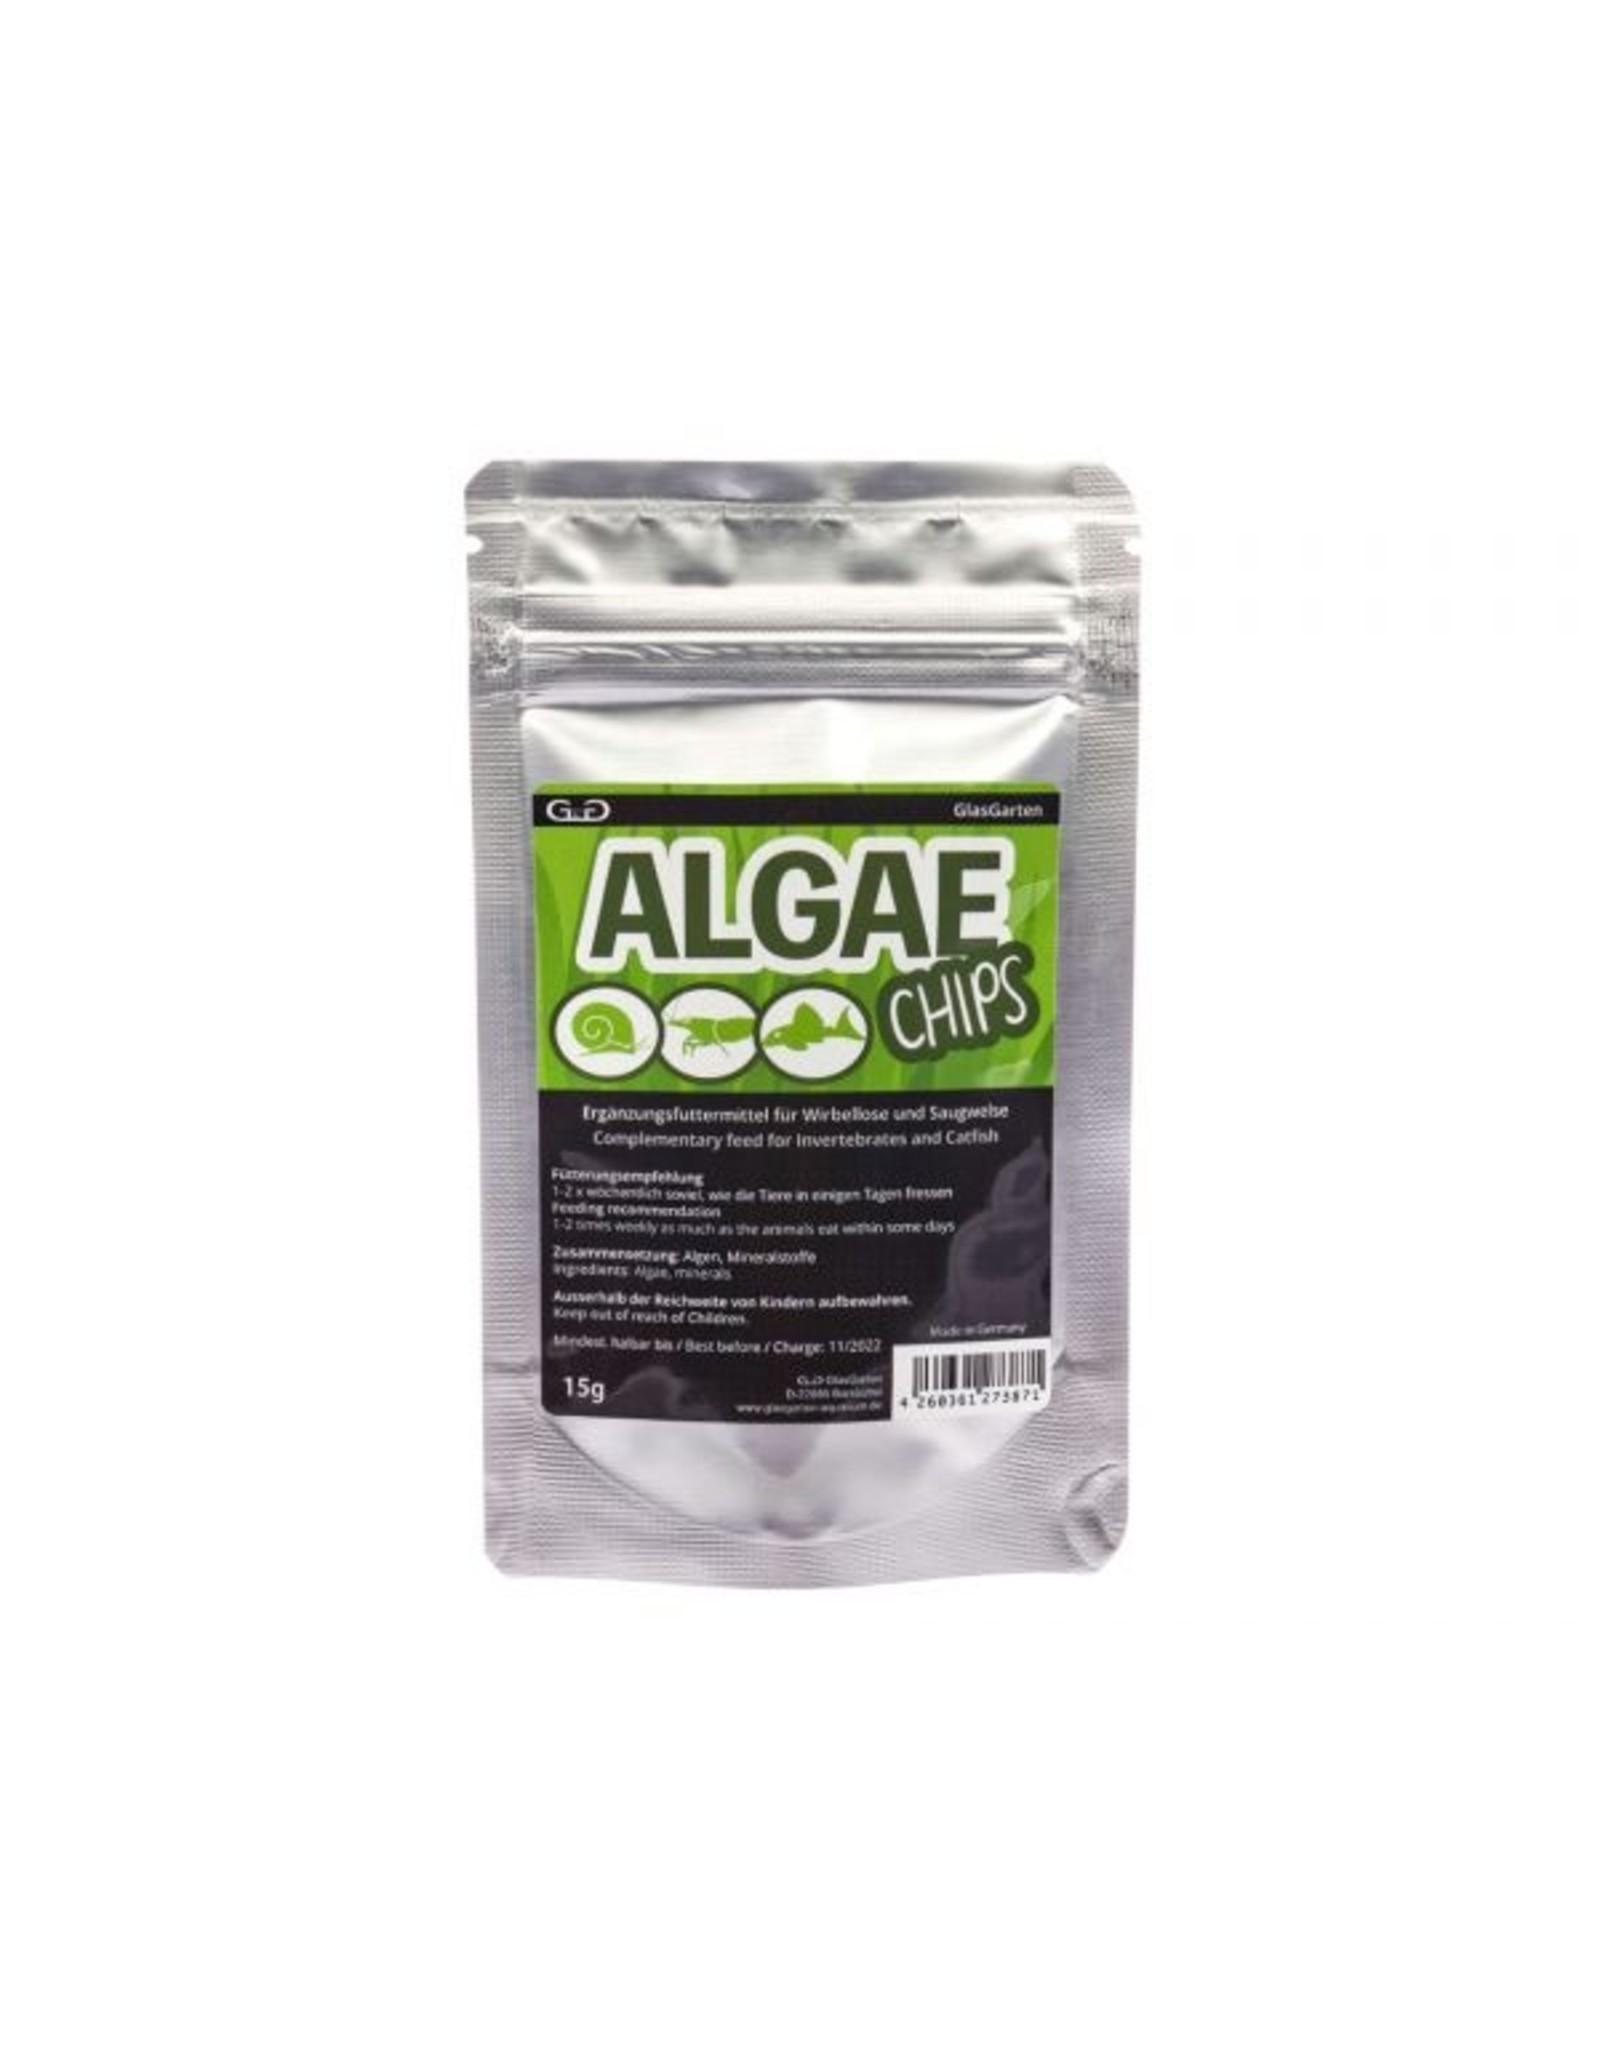 GlasGarten GLASGARTEN Algae Chips 15g